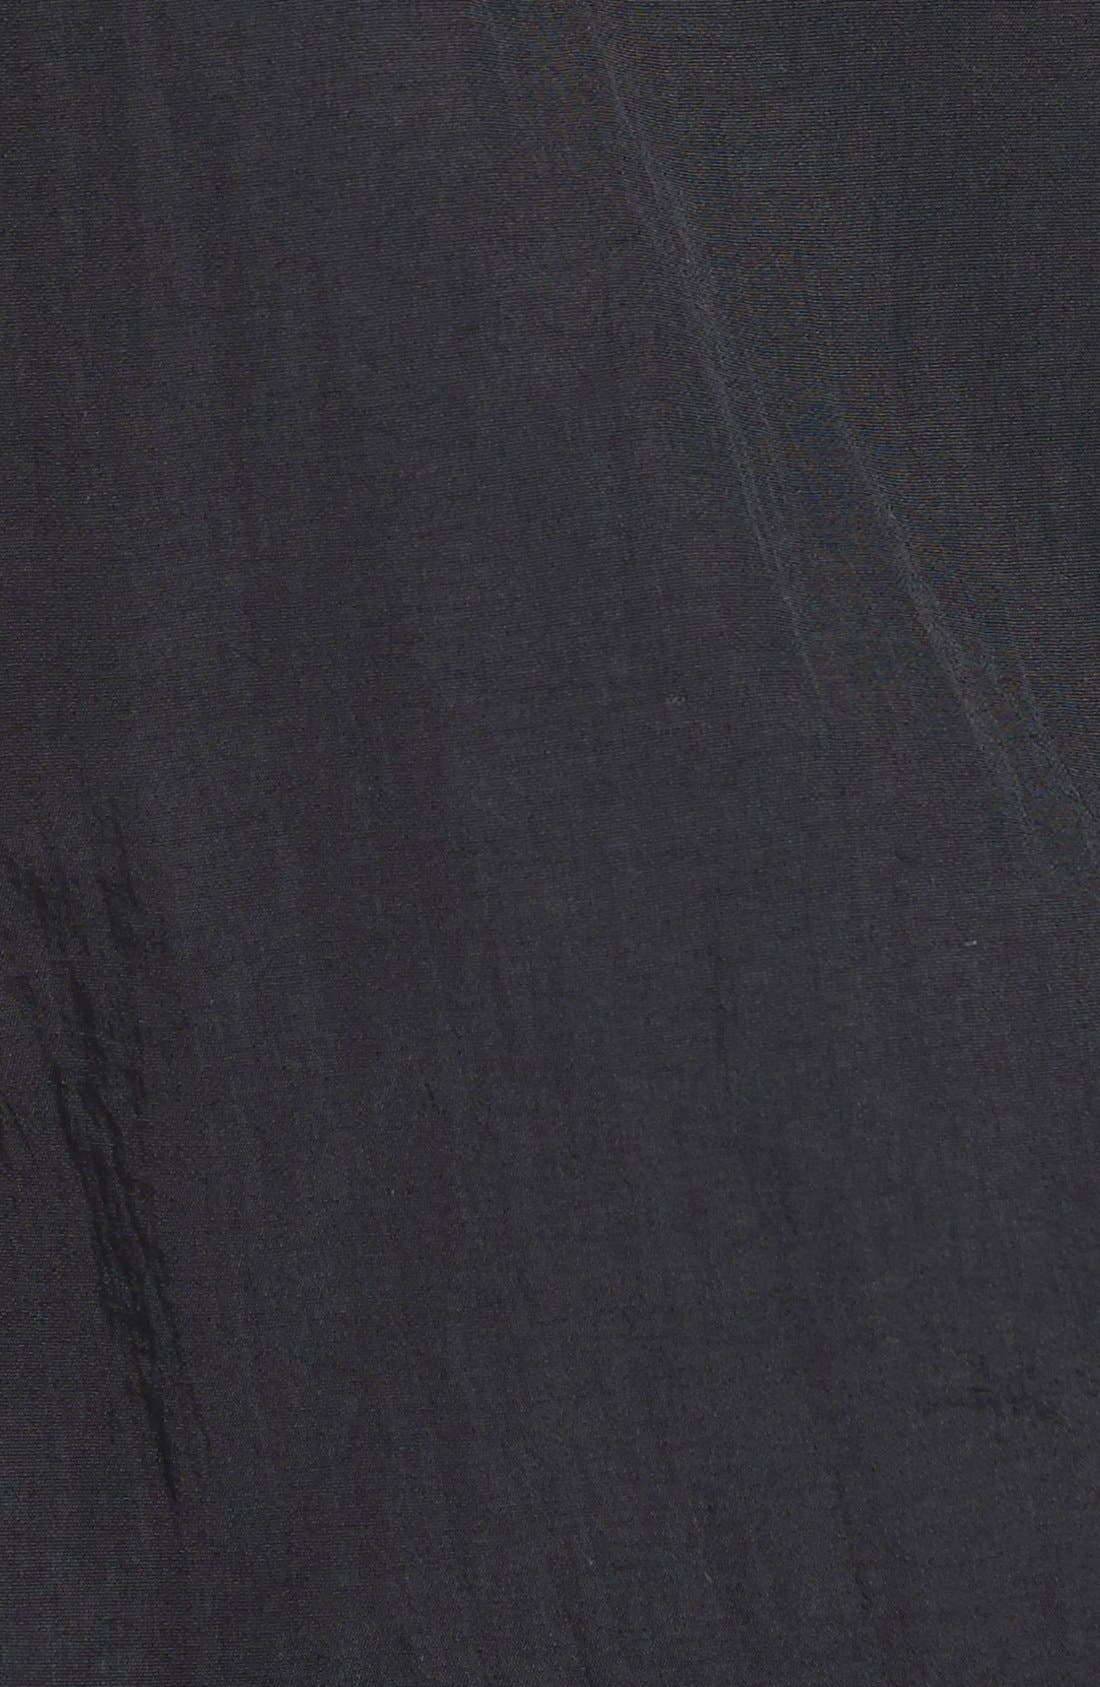 MITCHELL & NESS,                             'San Antonio Spurs' Warm-Up Jacket,                             Alternate thumbnail 7, color,                             001